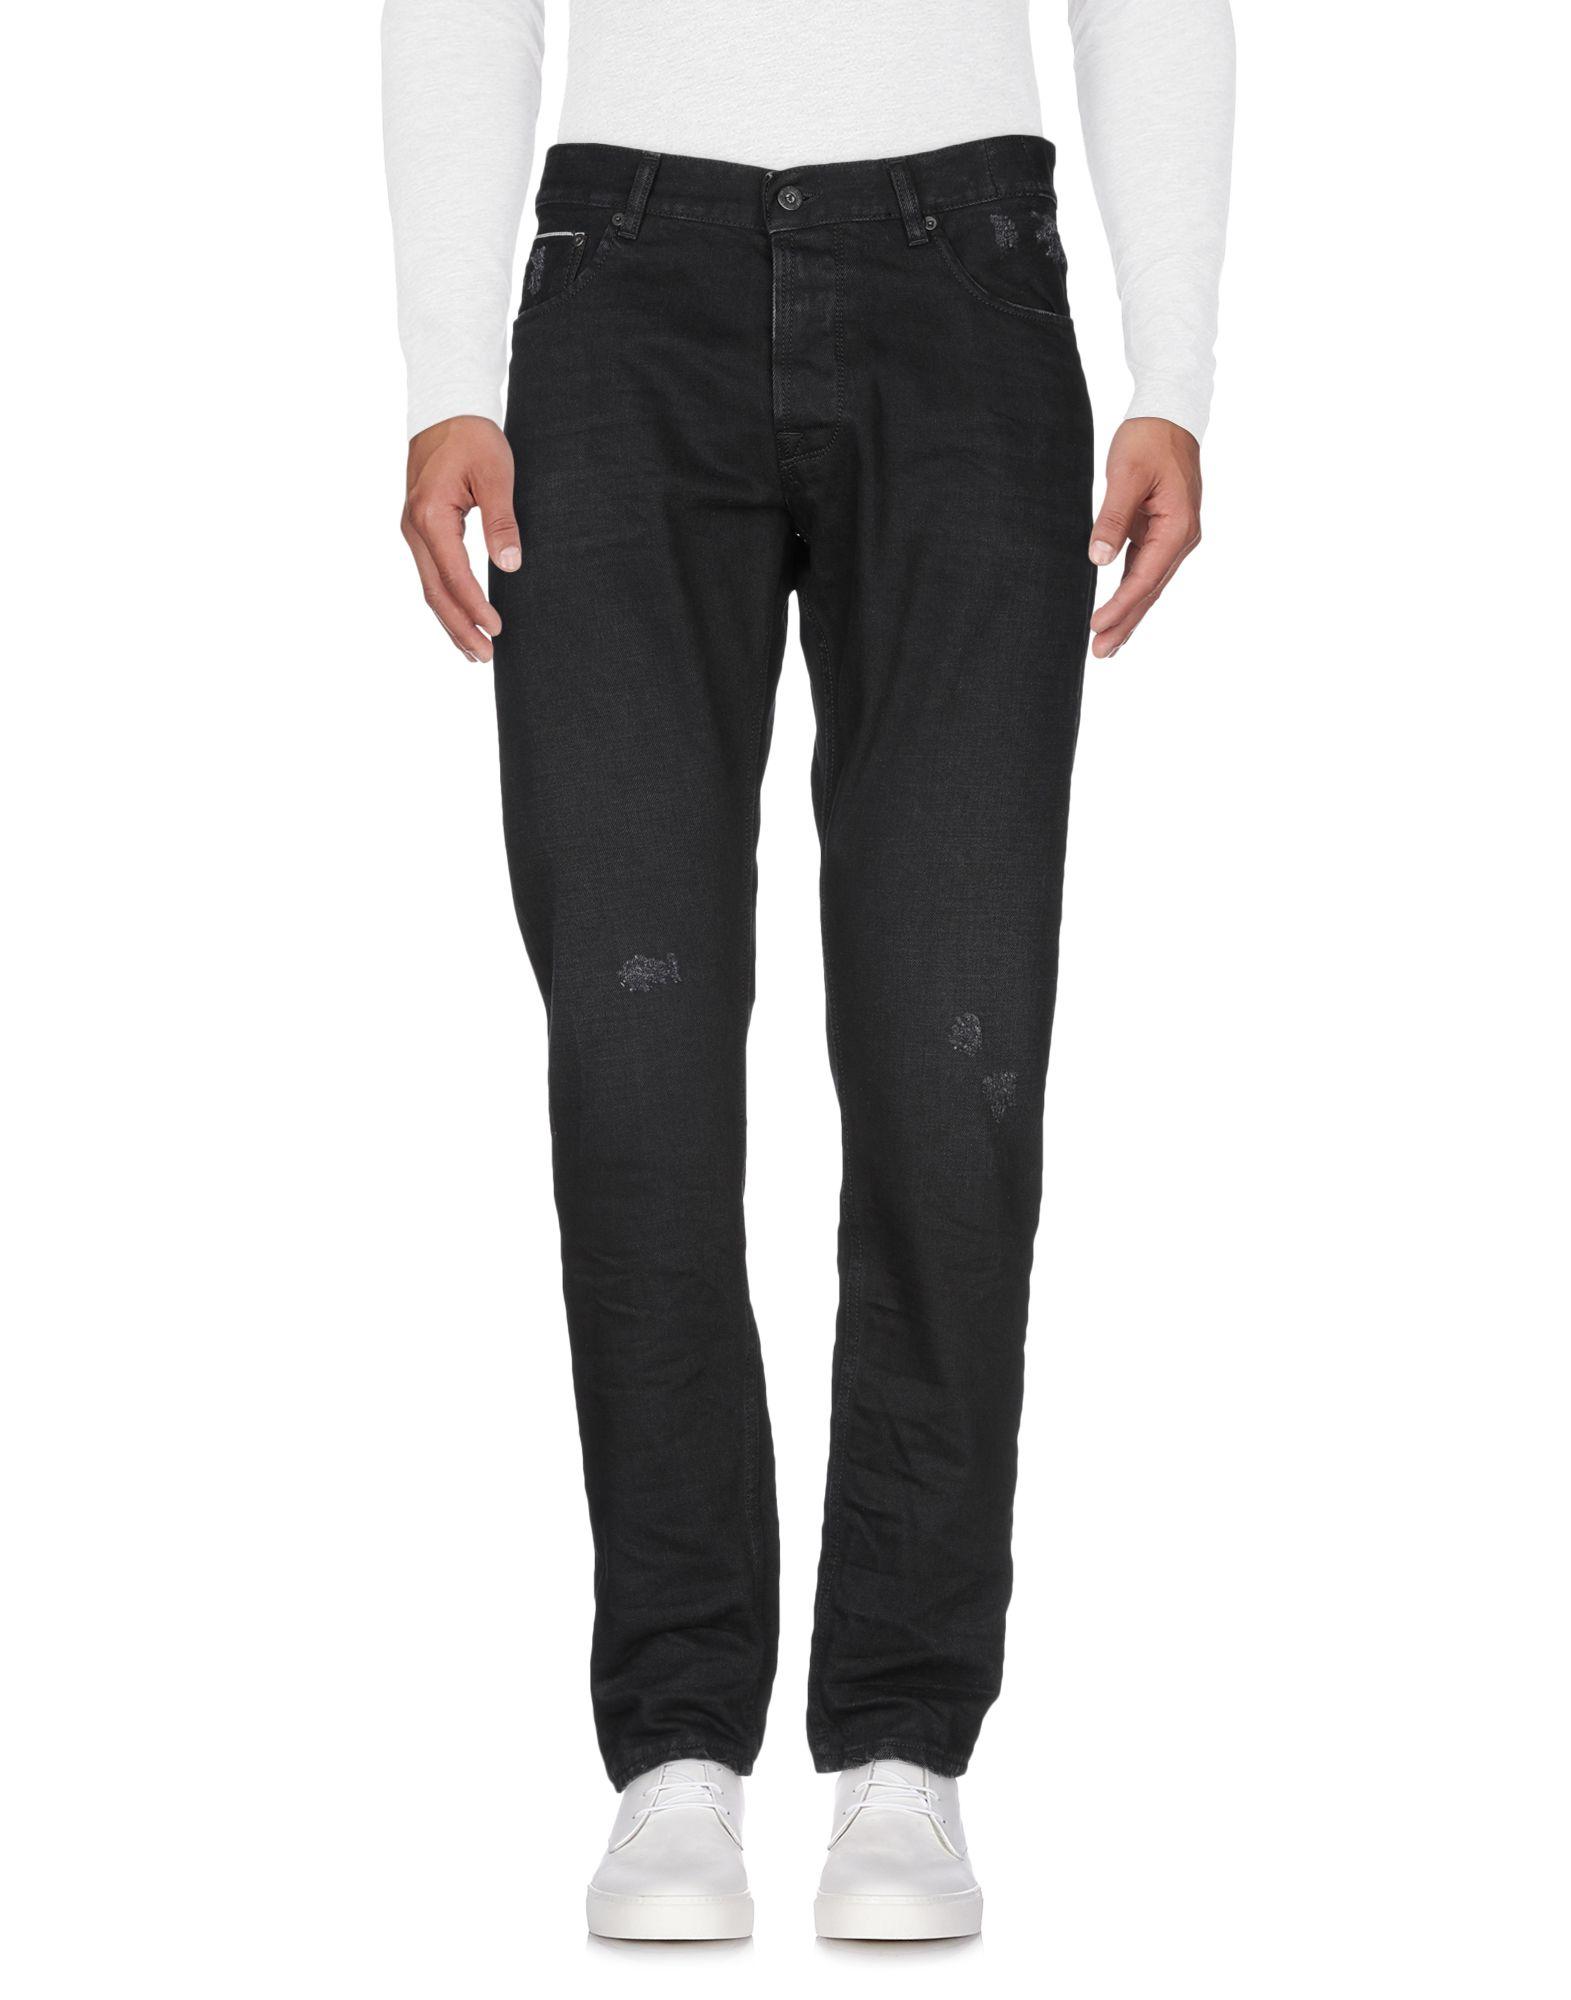 Pantaloni Jeans Jeans Jeans The.Nim uomo - 42689592GO 498